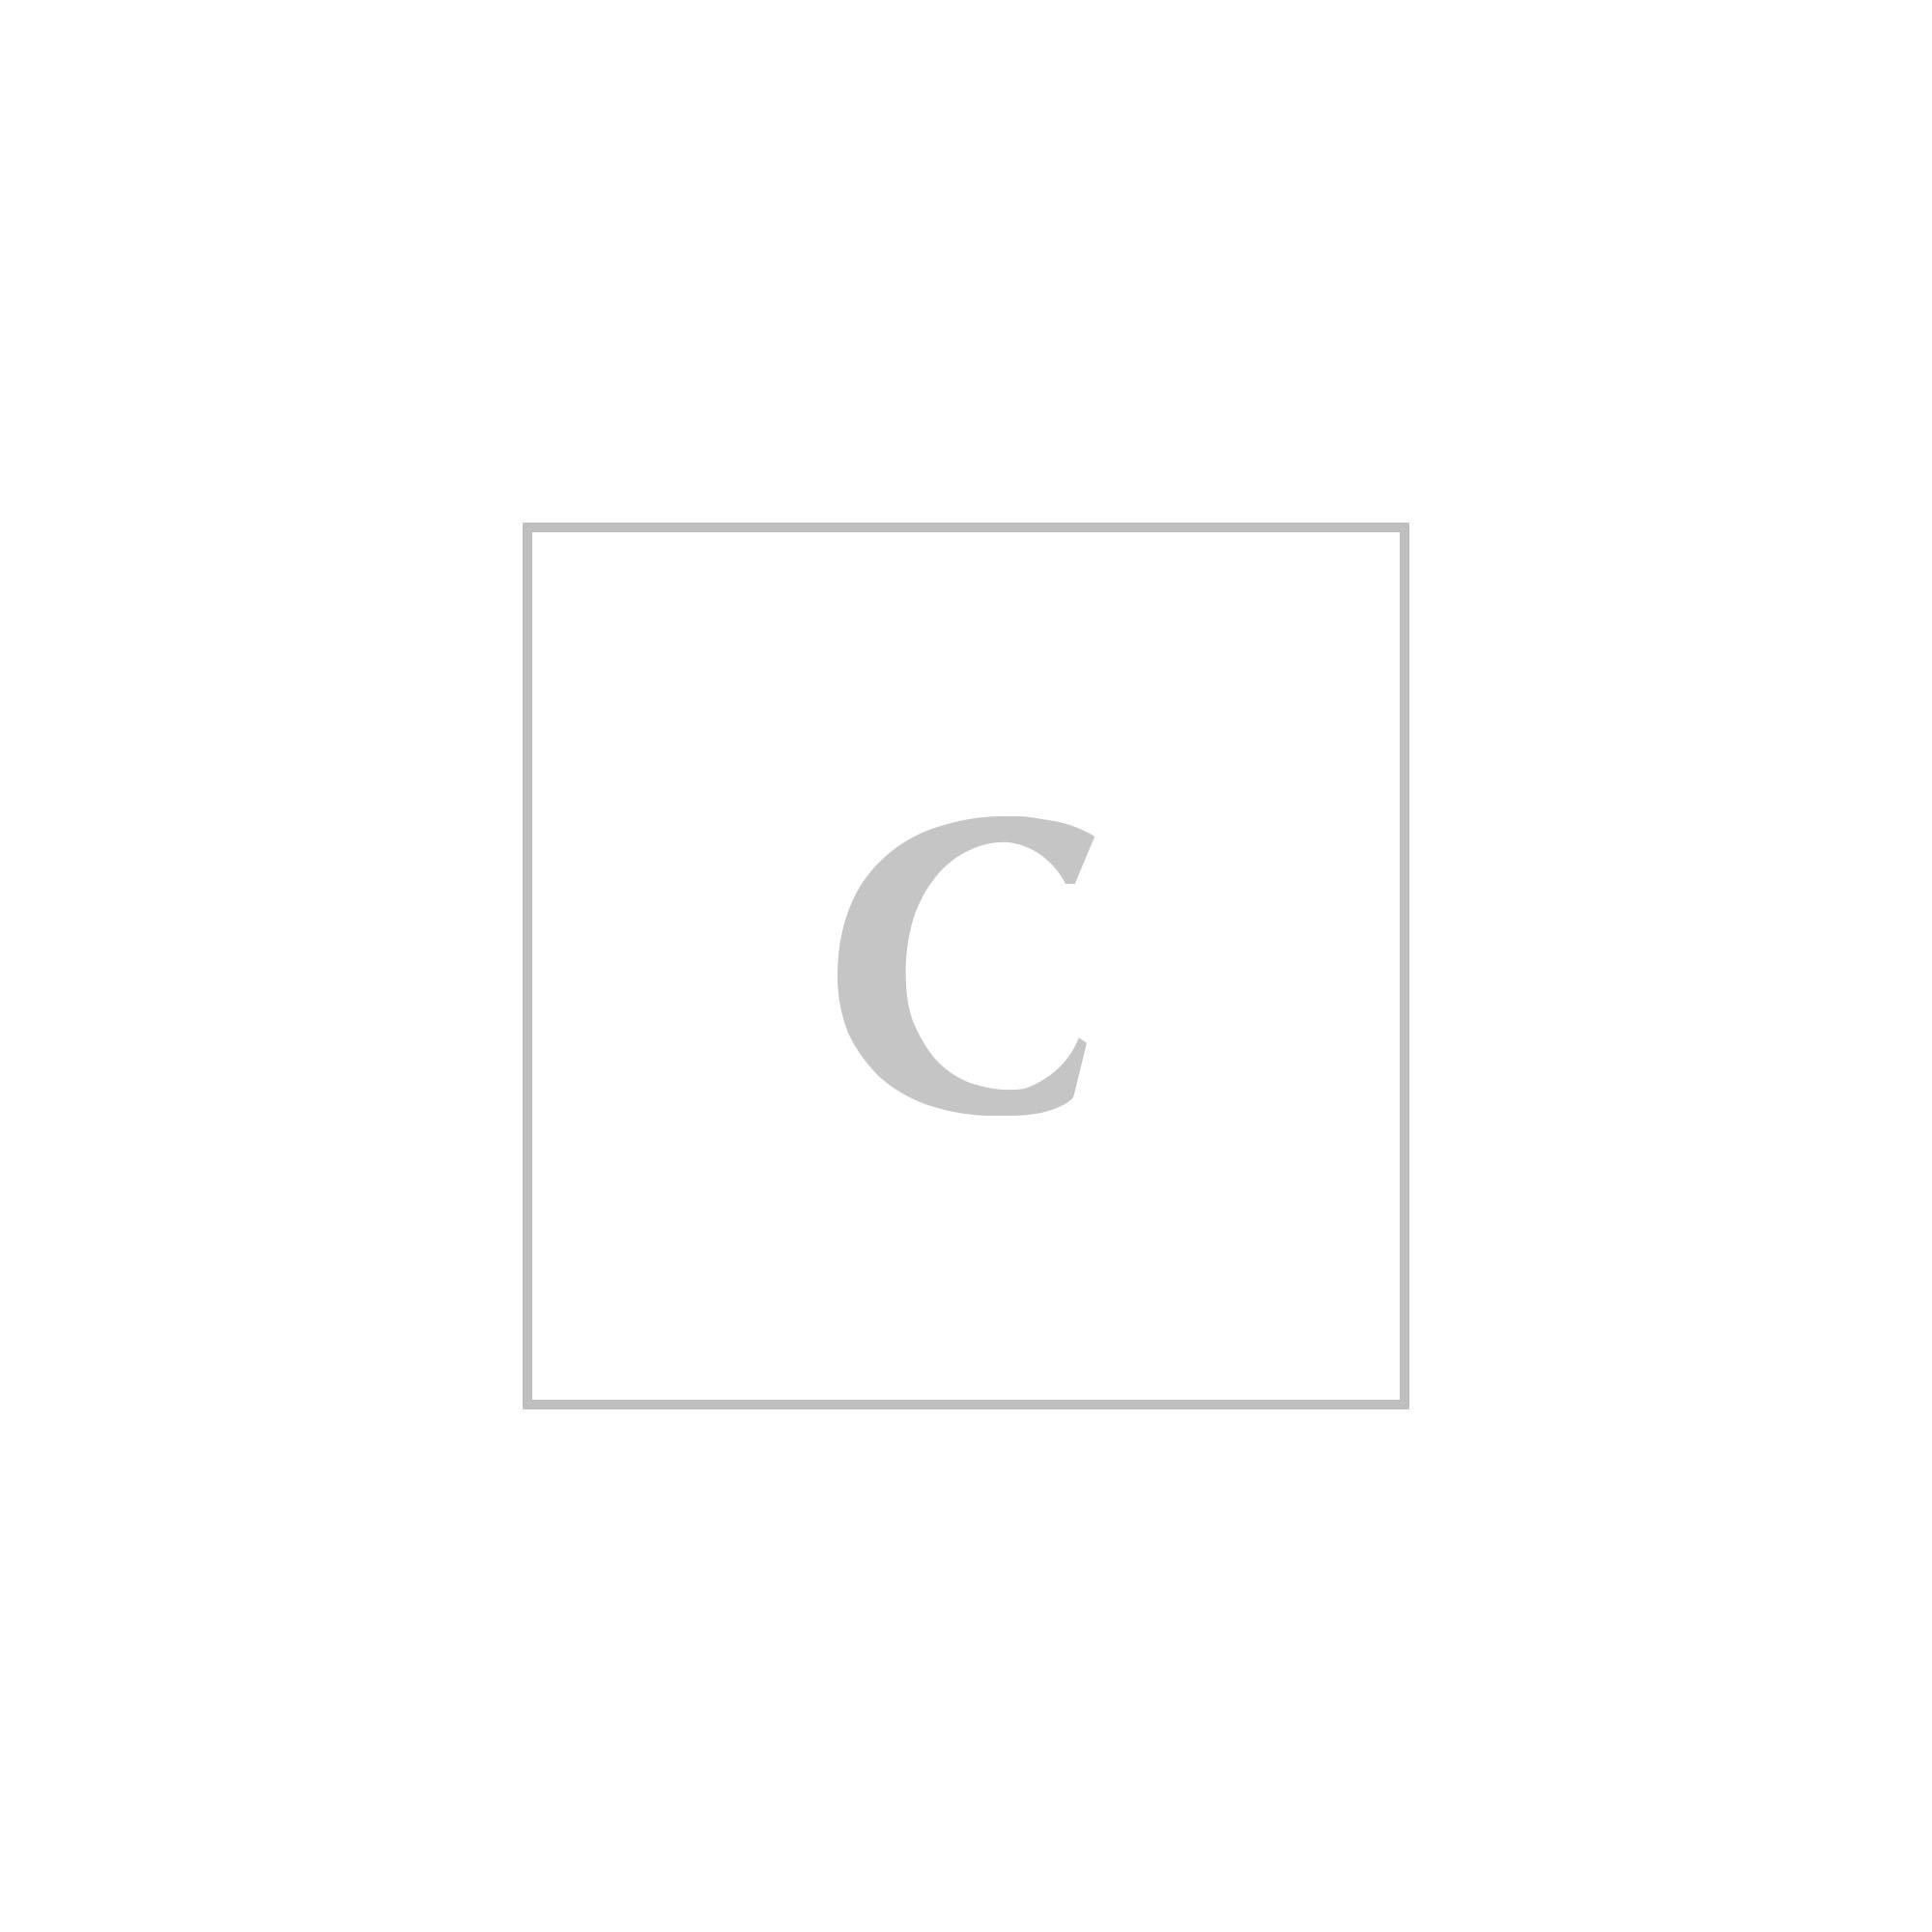 Saint laurent ysl portafoglio monogram grain de poudre